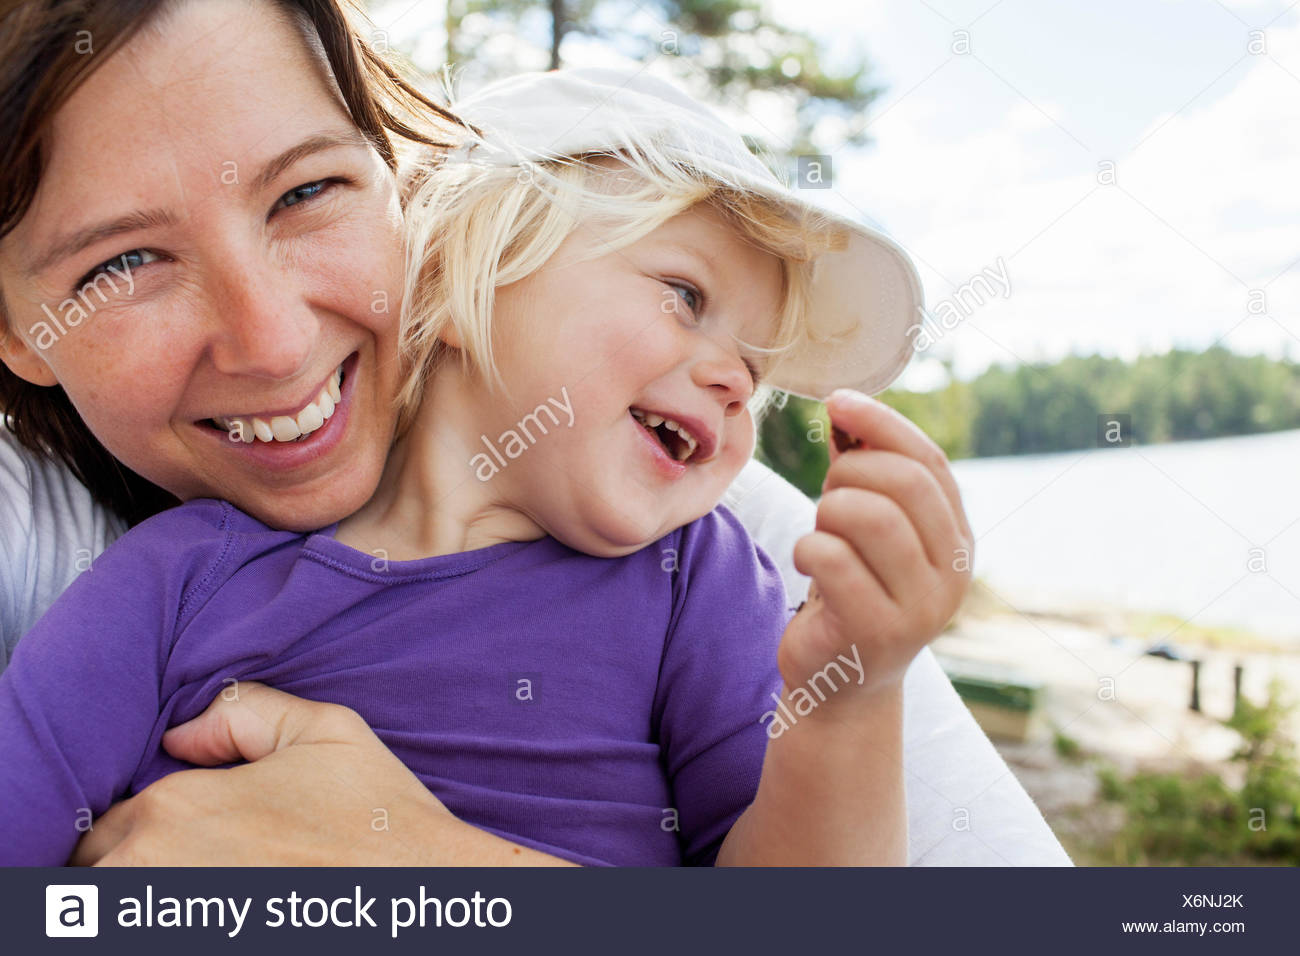 La Svezia, Vastergotland, Vattlefjall riserva naturale, azienda madre figlia (2-3) Immagini Stock